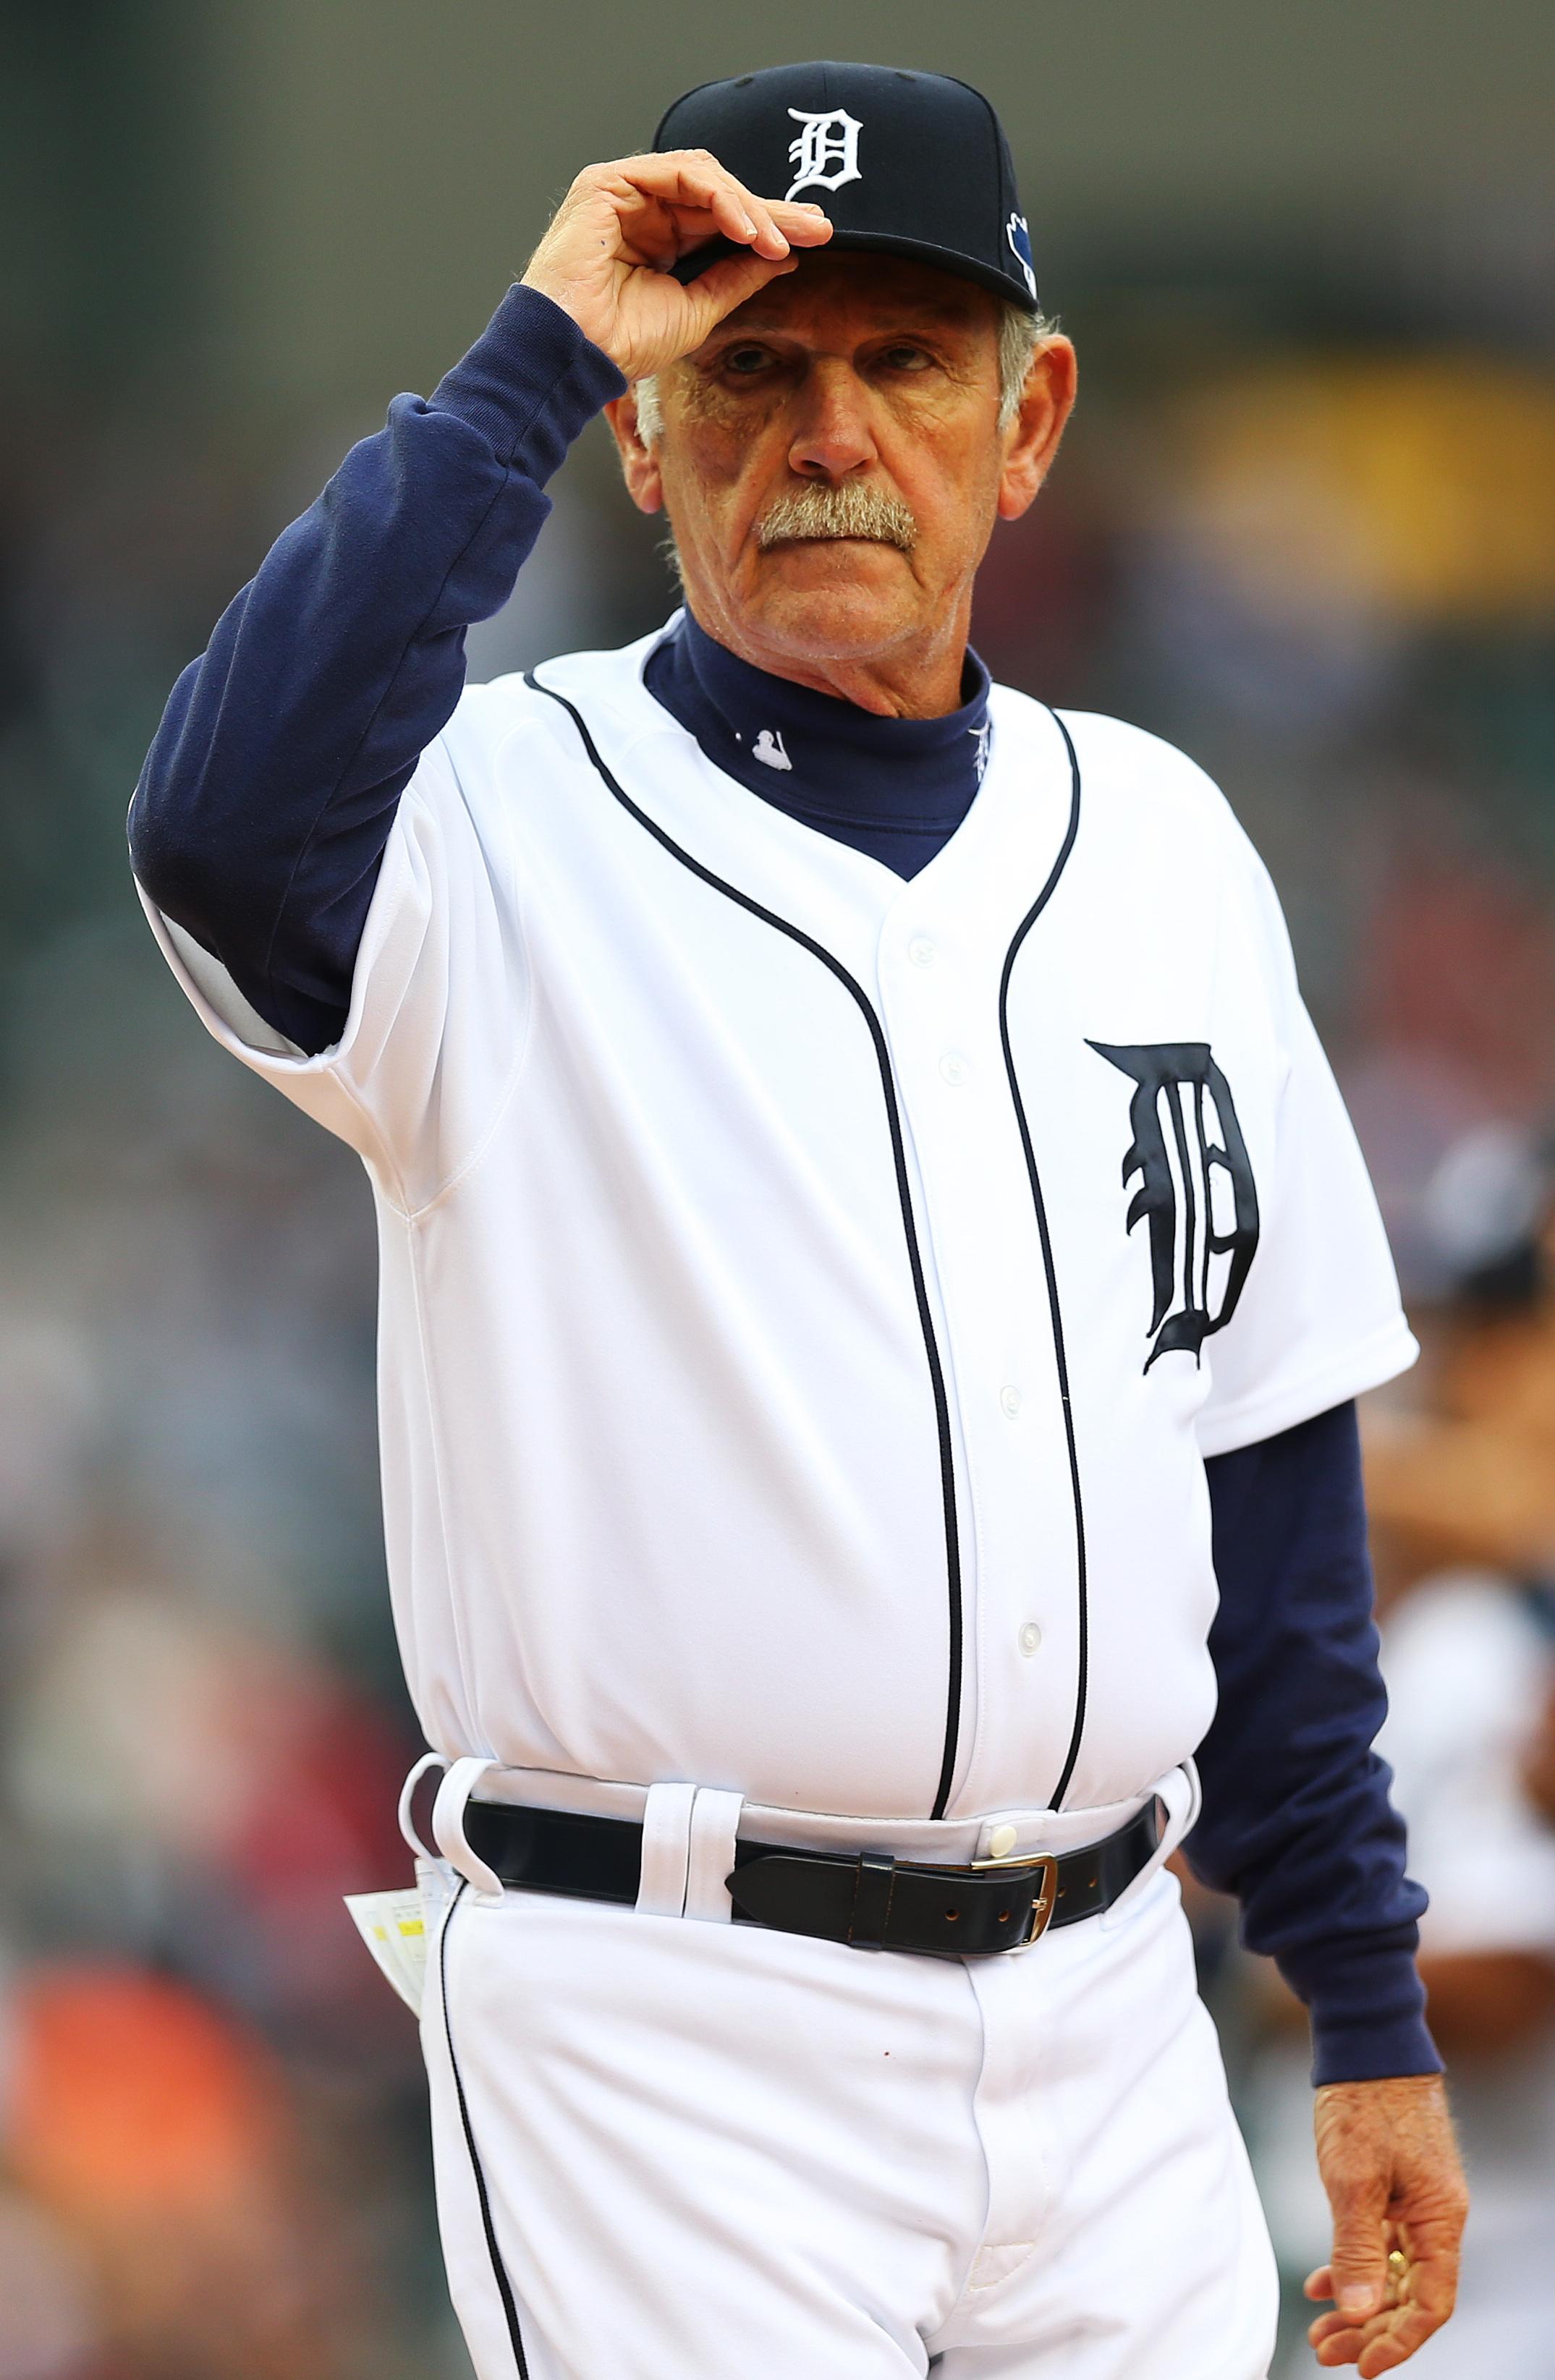 Detroit Tigers Manager Jim Leyland Steps Down